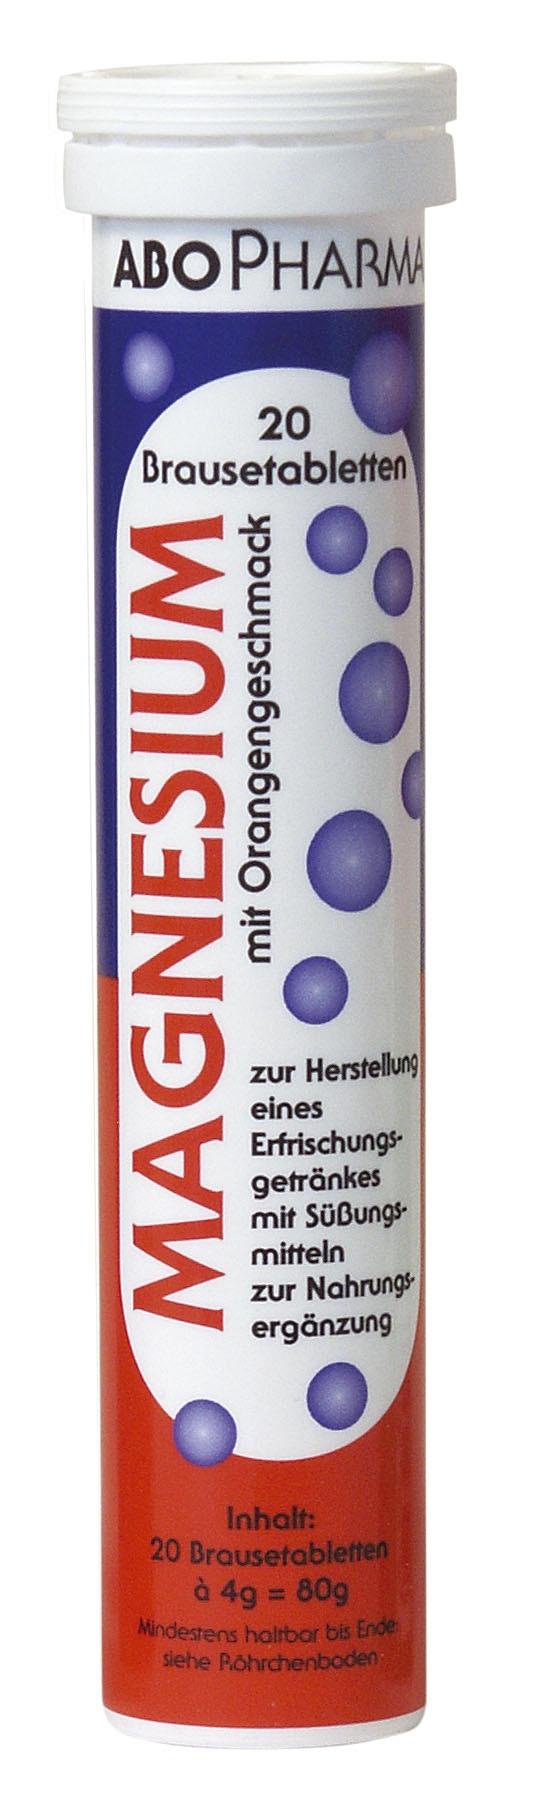 Magnesium Brausetabletten